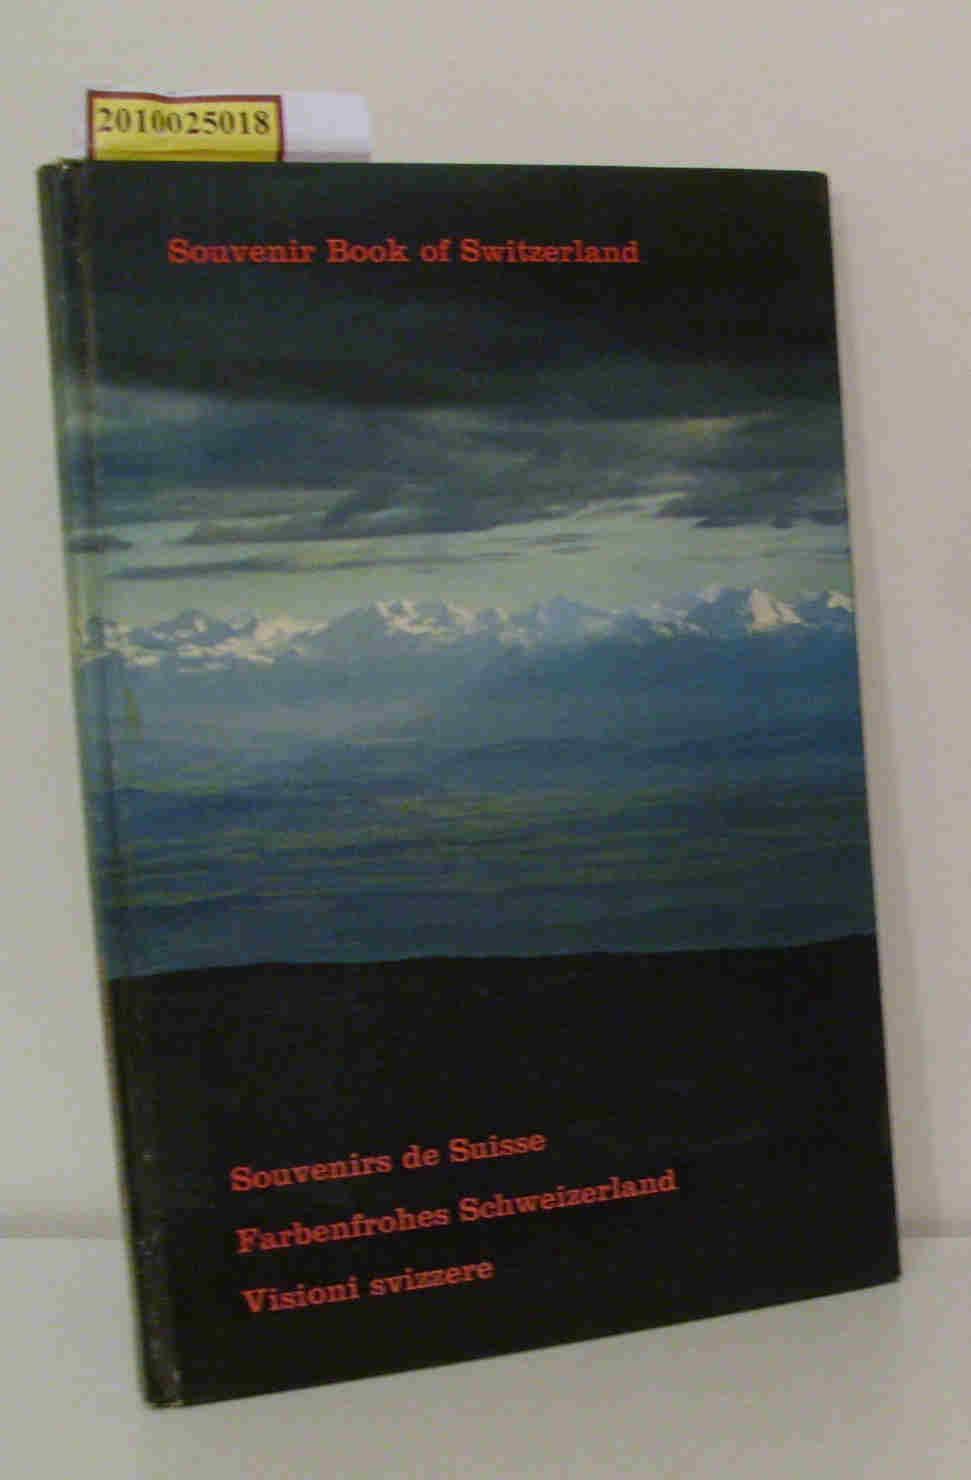 Souvenir Book of Switzerland